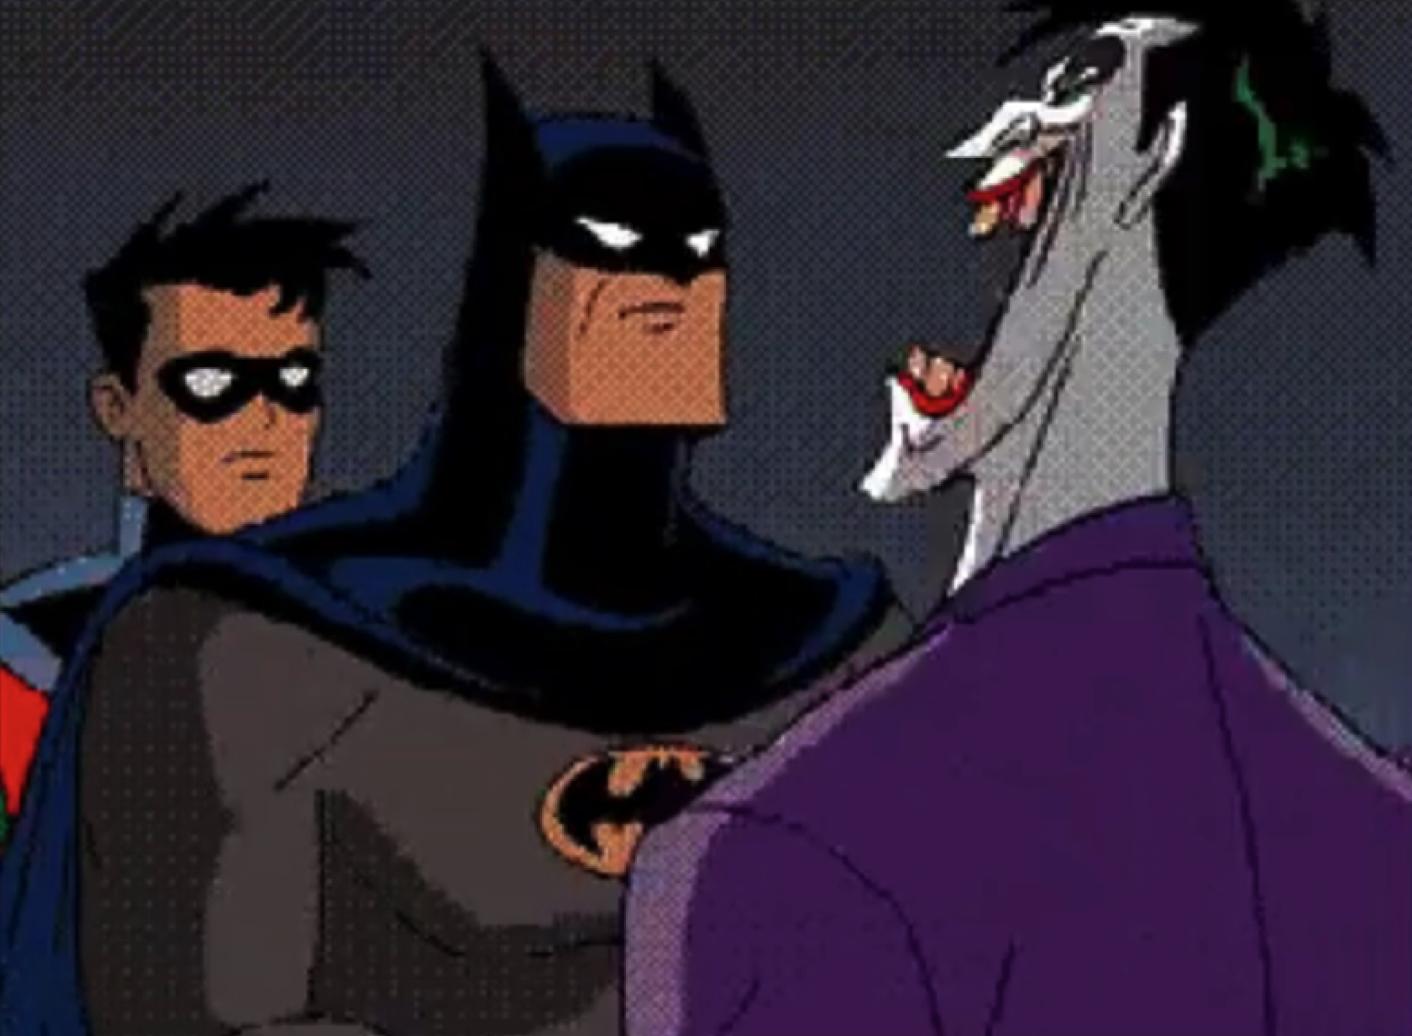 review_the_adventures_of_batman_and_robin_sega_CD_the_splintering_joker